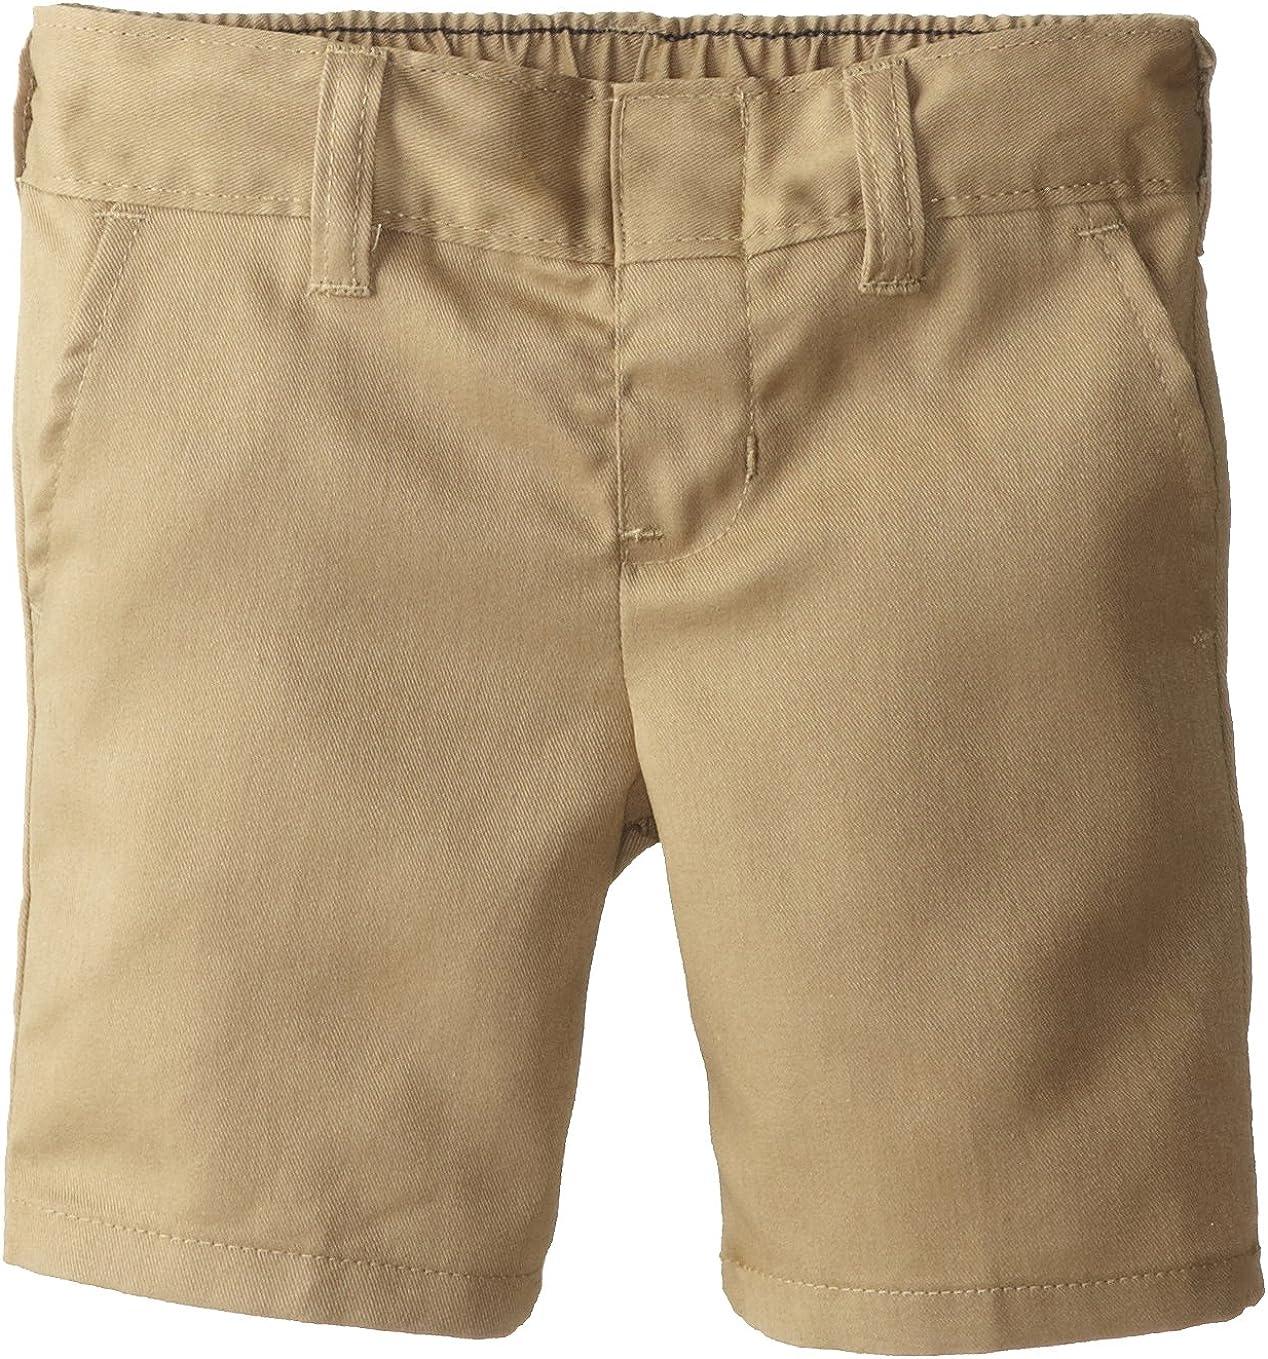 Dickies Boys' Pull-On Short: Clothing